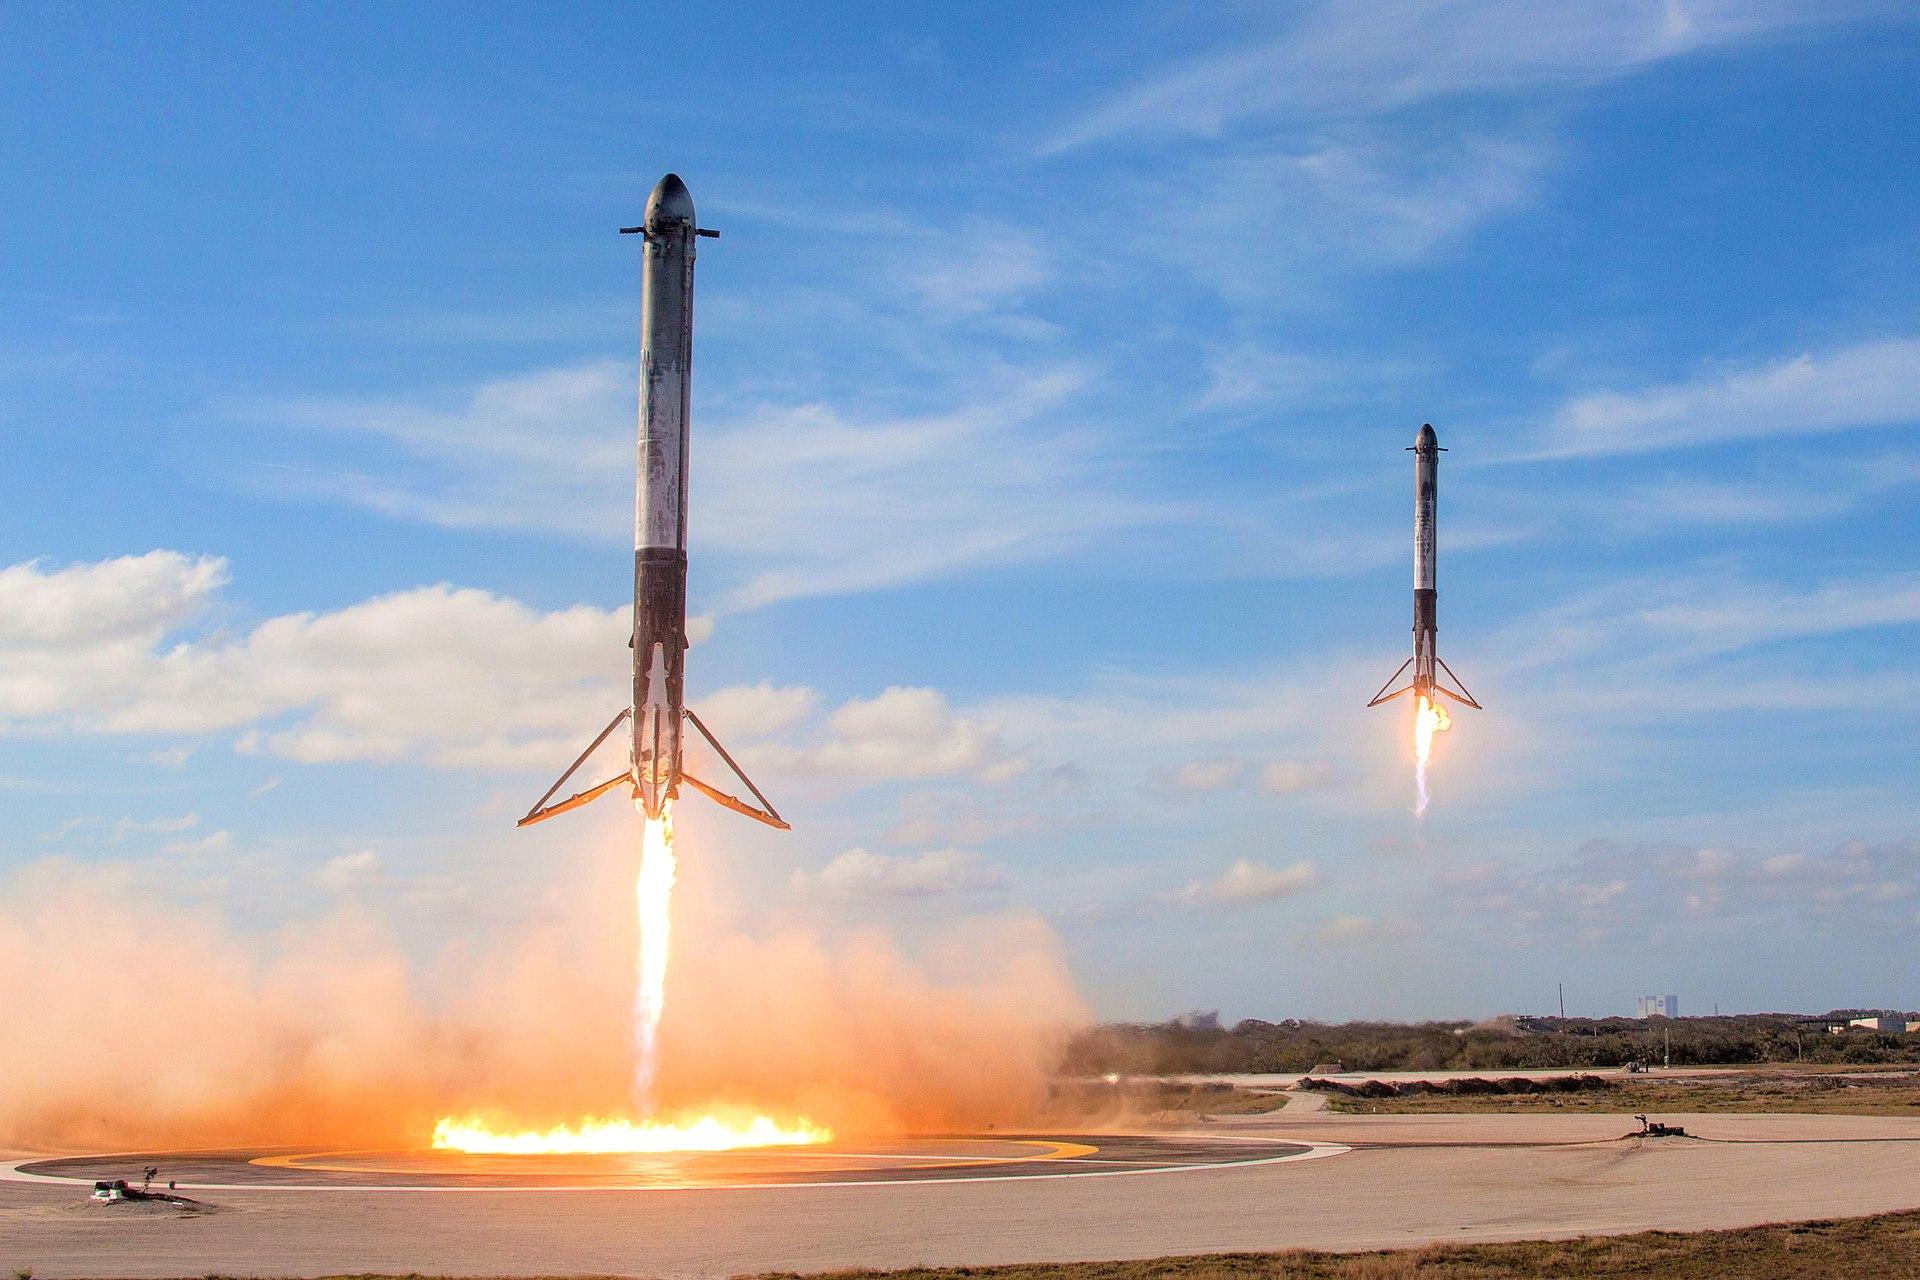 Side boosters landing